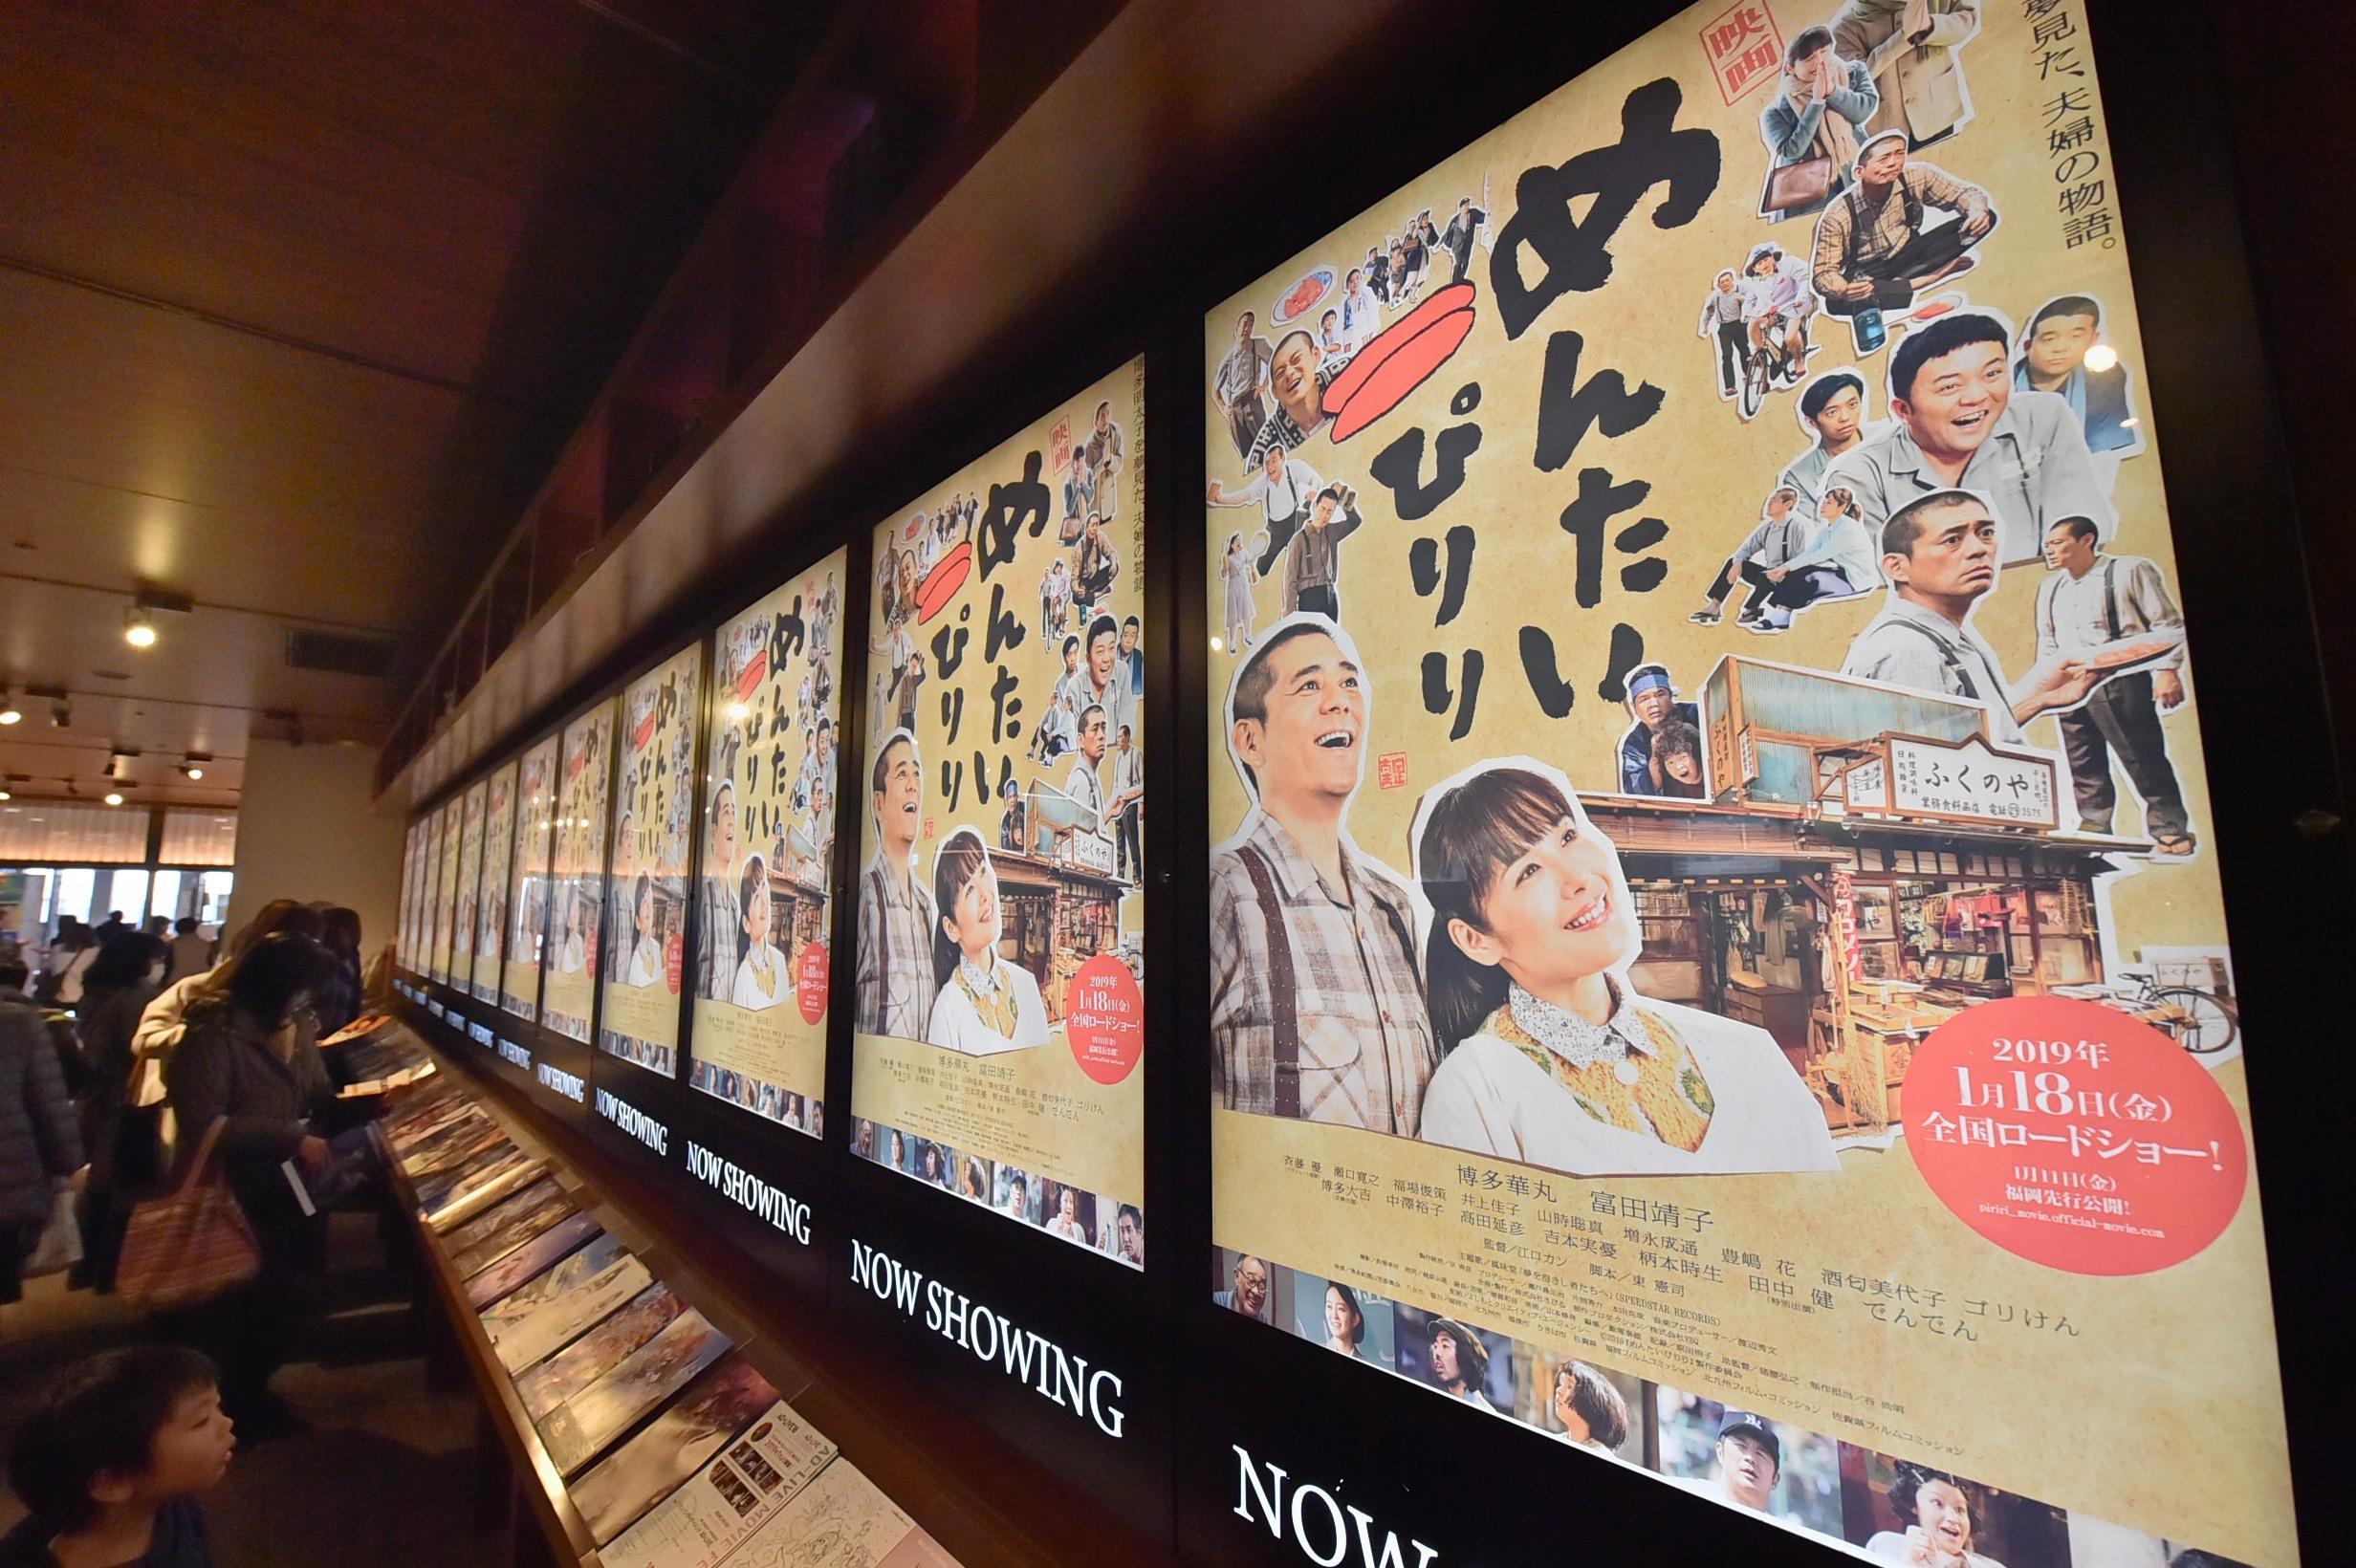 http://news.yoshimoto.co.jp/20190115125755-d467bfb6424c971874d7dfb522825dd316c2d018.jpg